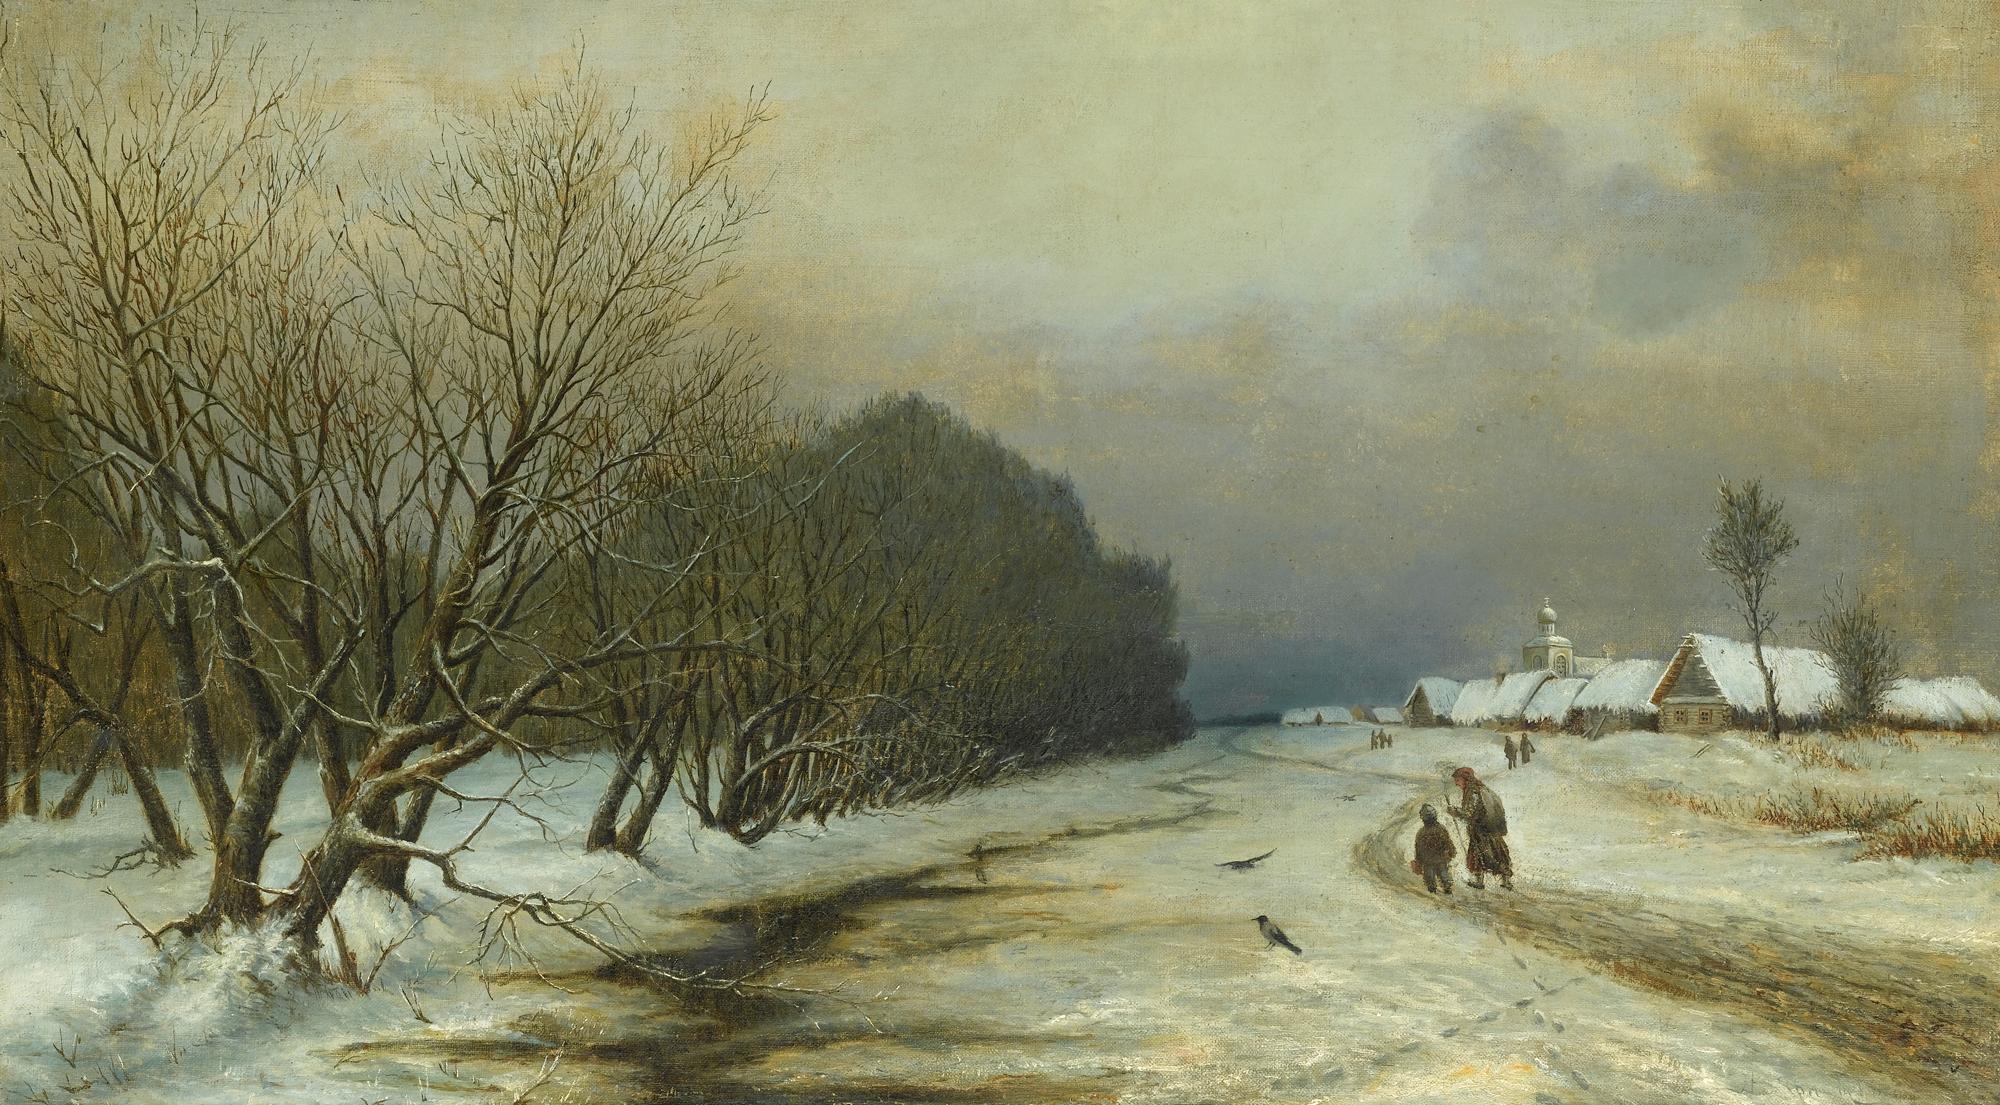 19th century landscape paintings | Gradovsky (Russian, 19th Century) - A Winter Landscape